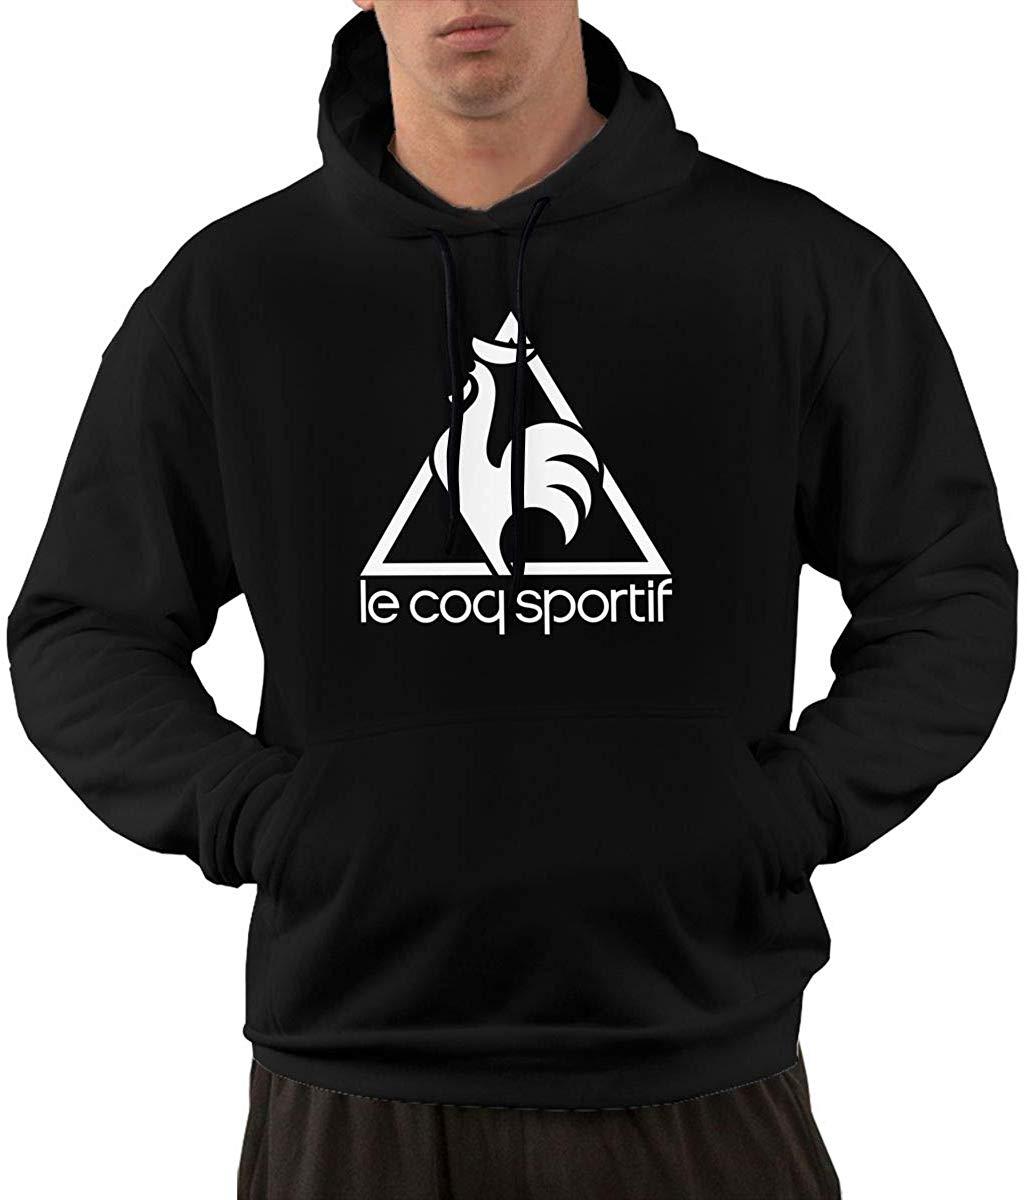 TSDFC Mens Le Coq Sportif Logo Funny Hoodie Sweatshirt Kangaroo Black Unisex Men Women Hoodie